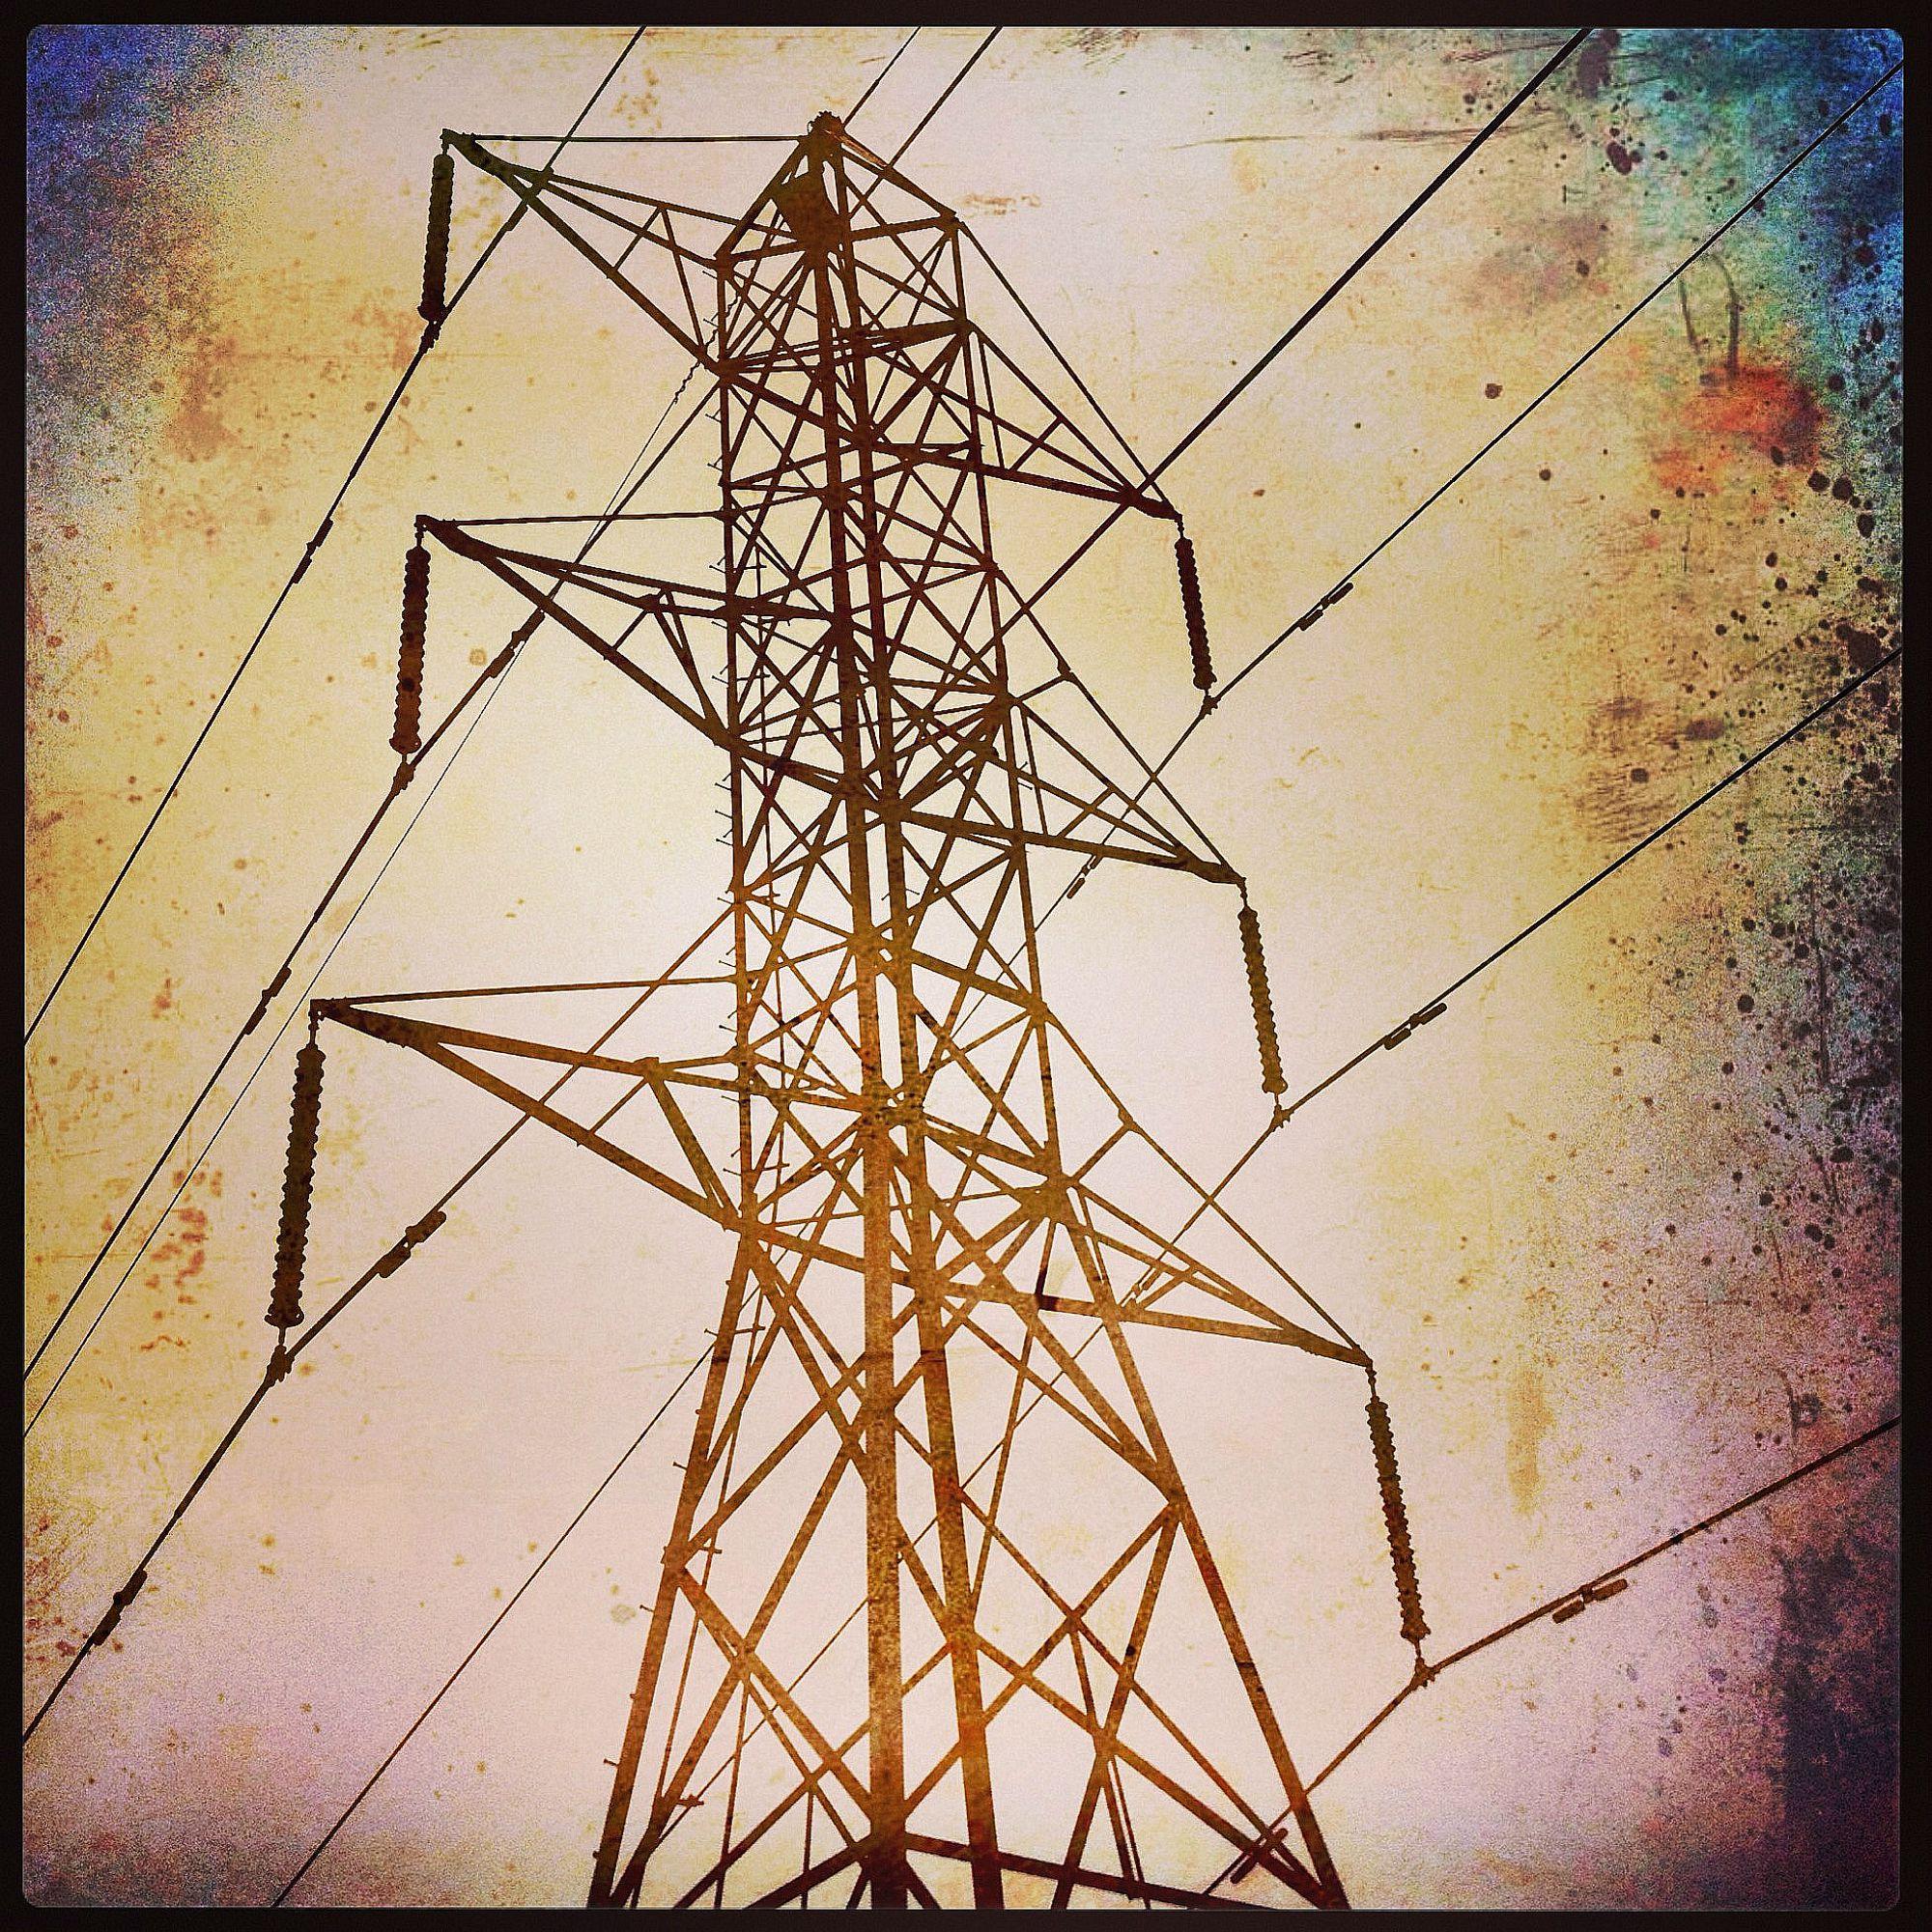 Power lines, 2013